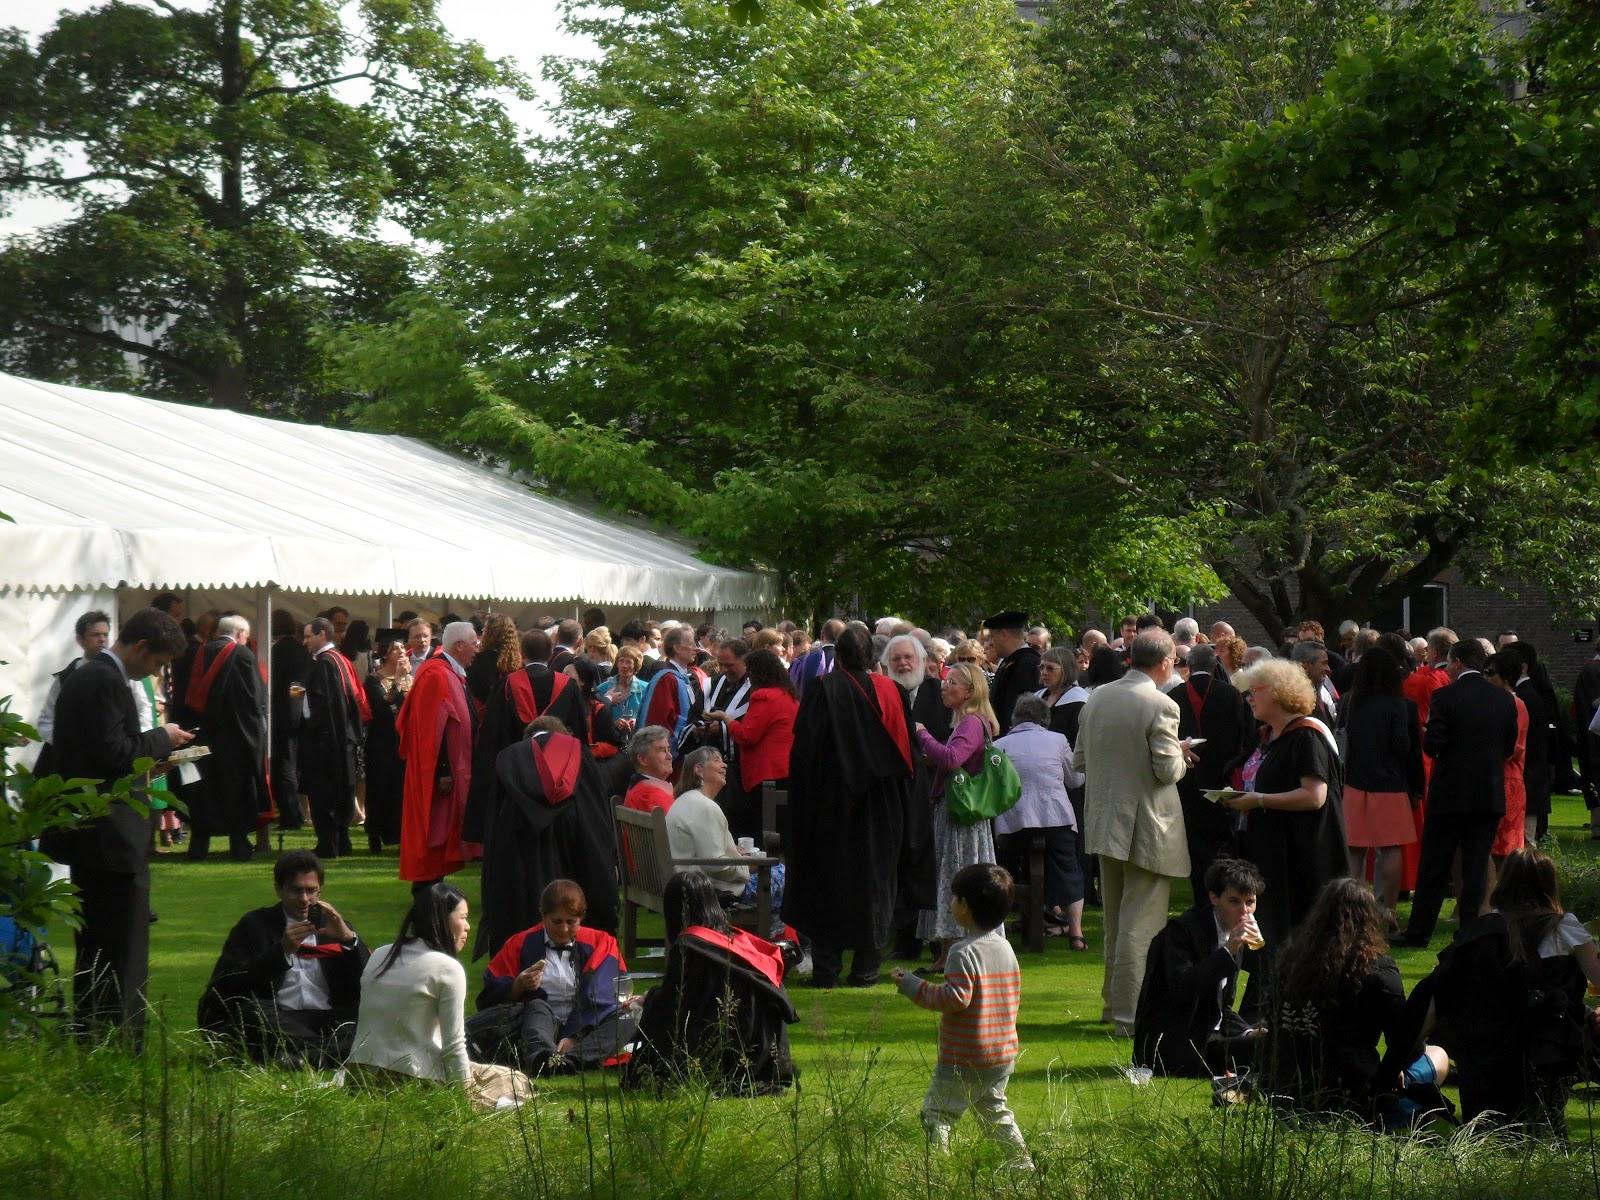 Worcester College Gardeners Encaenia Garden Party 2012